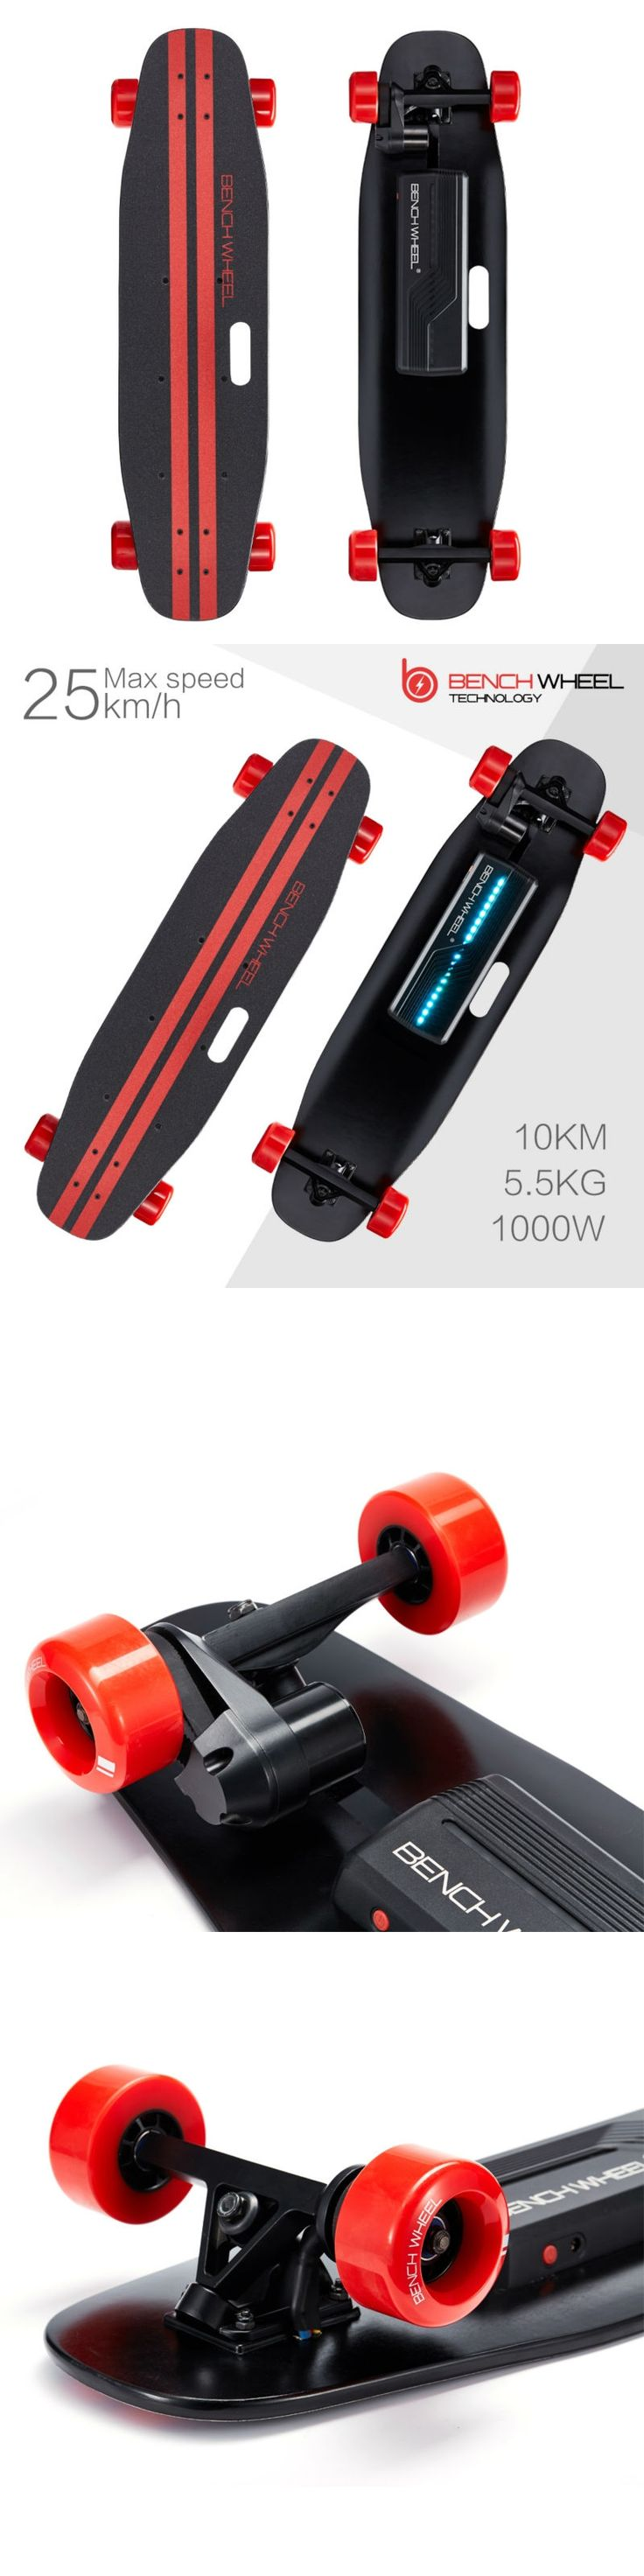 Hot Backfire Benchwheel Electric Skateboard Motor with 1000w electric motor penny board scooter skateboard Cyber Monday